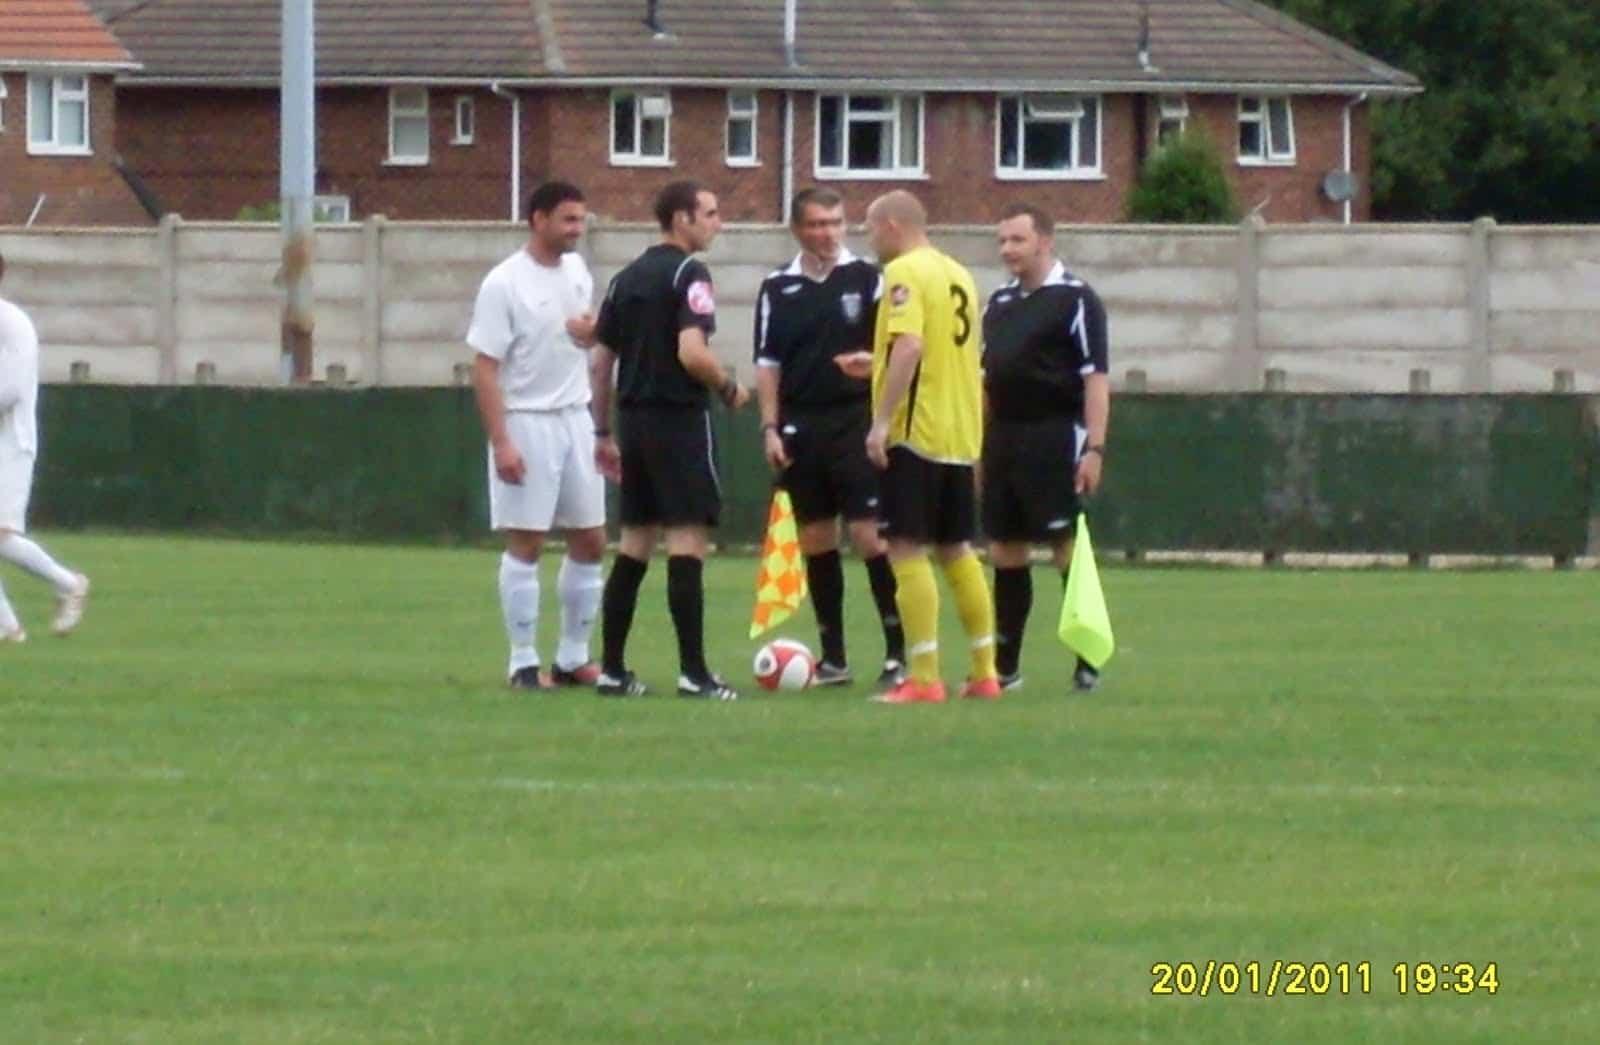 Roy Keane referee